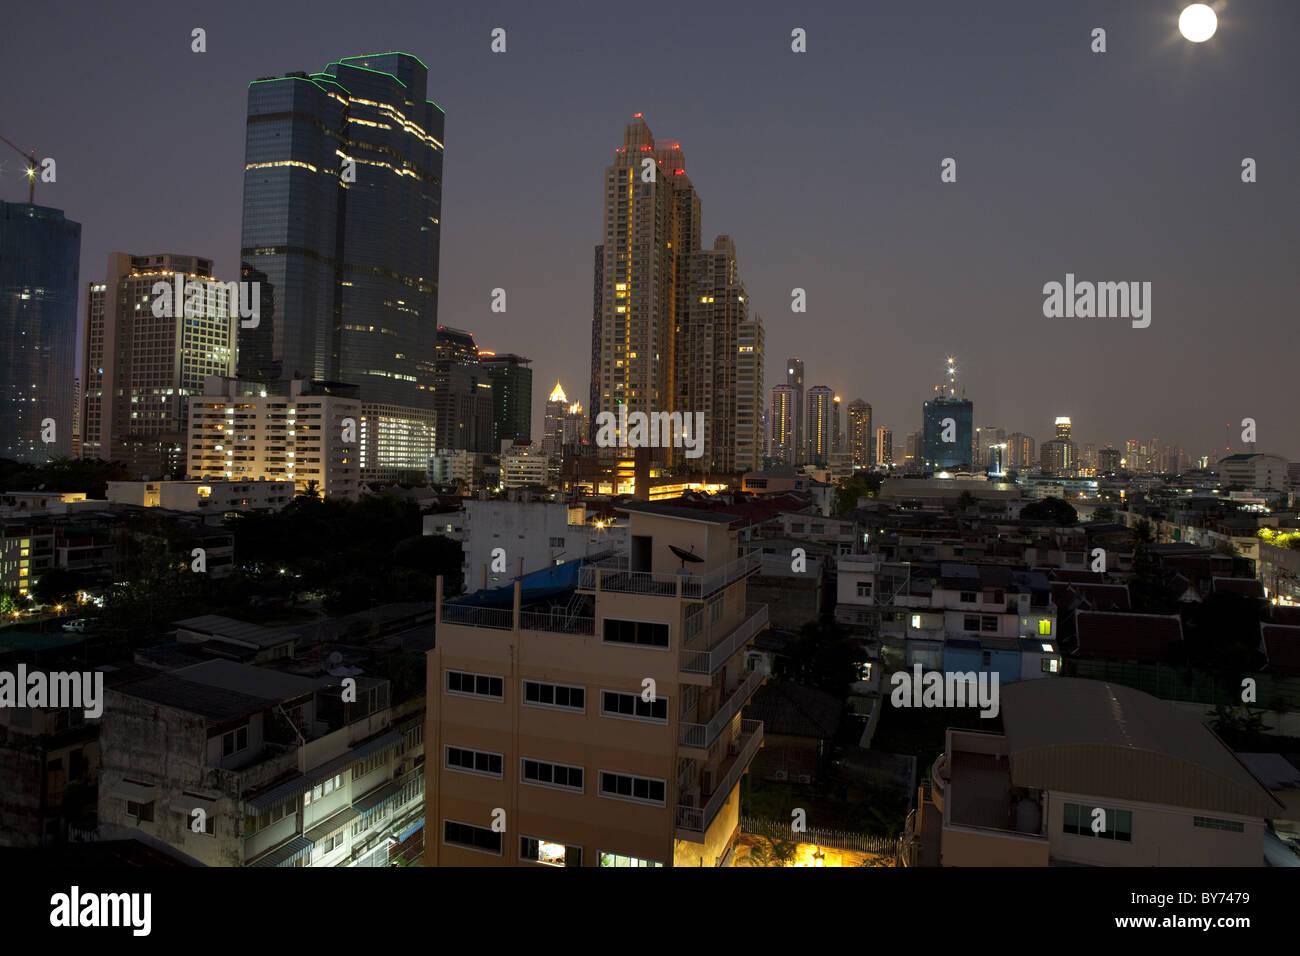 Full moon over Sathorn business area, Bangkok, Thailand - Stock Image